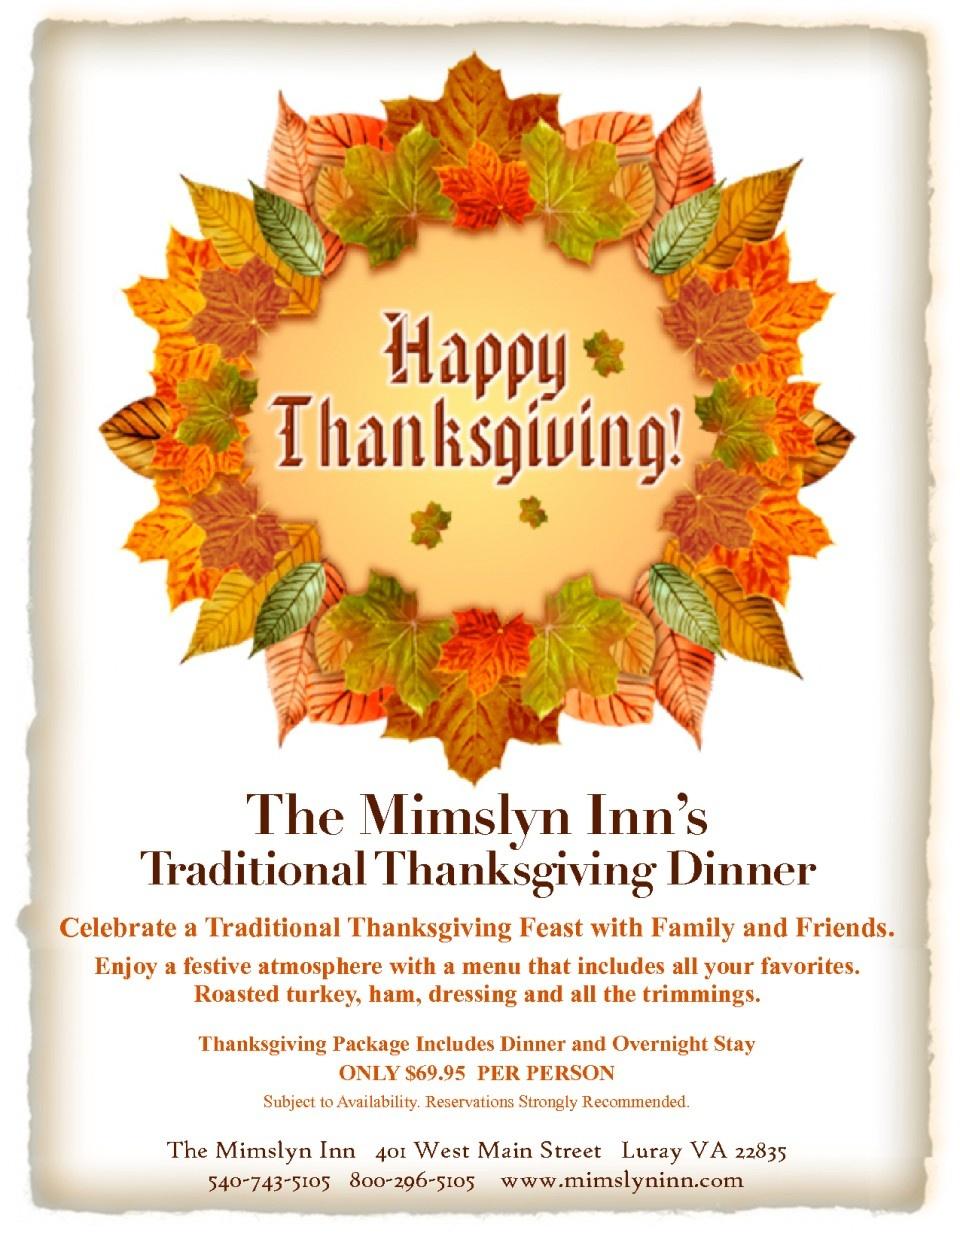 011 Free Thanksgiving Invitation Templates Fall Autumn Border Big - Free Printable Thanksgiving Invitation Templates